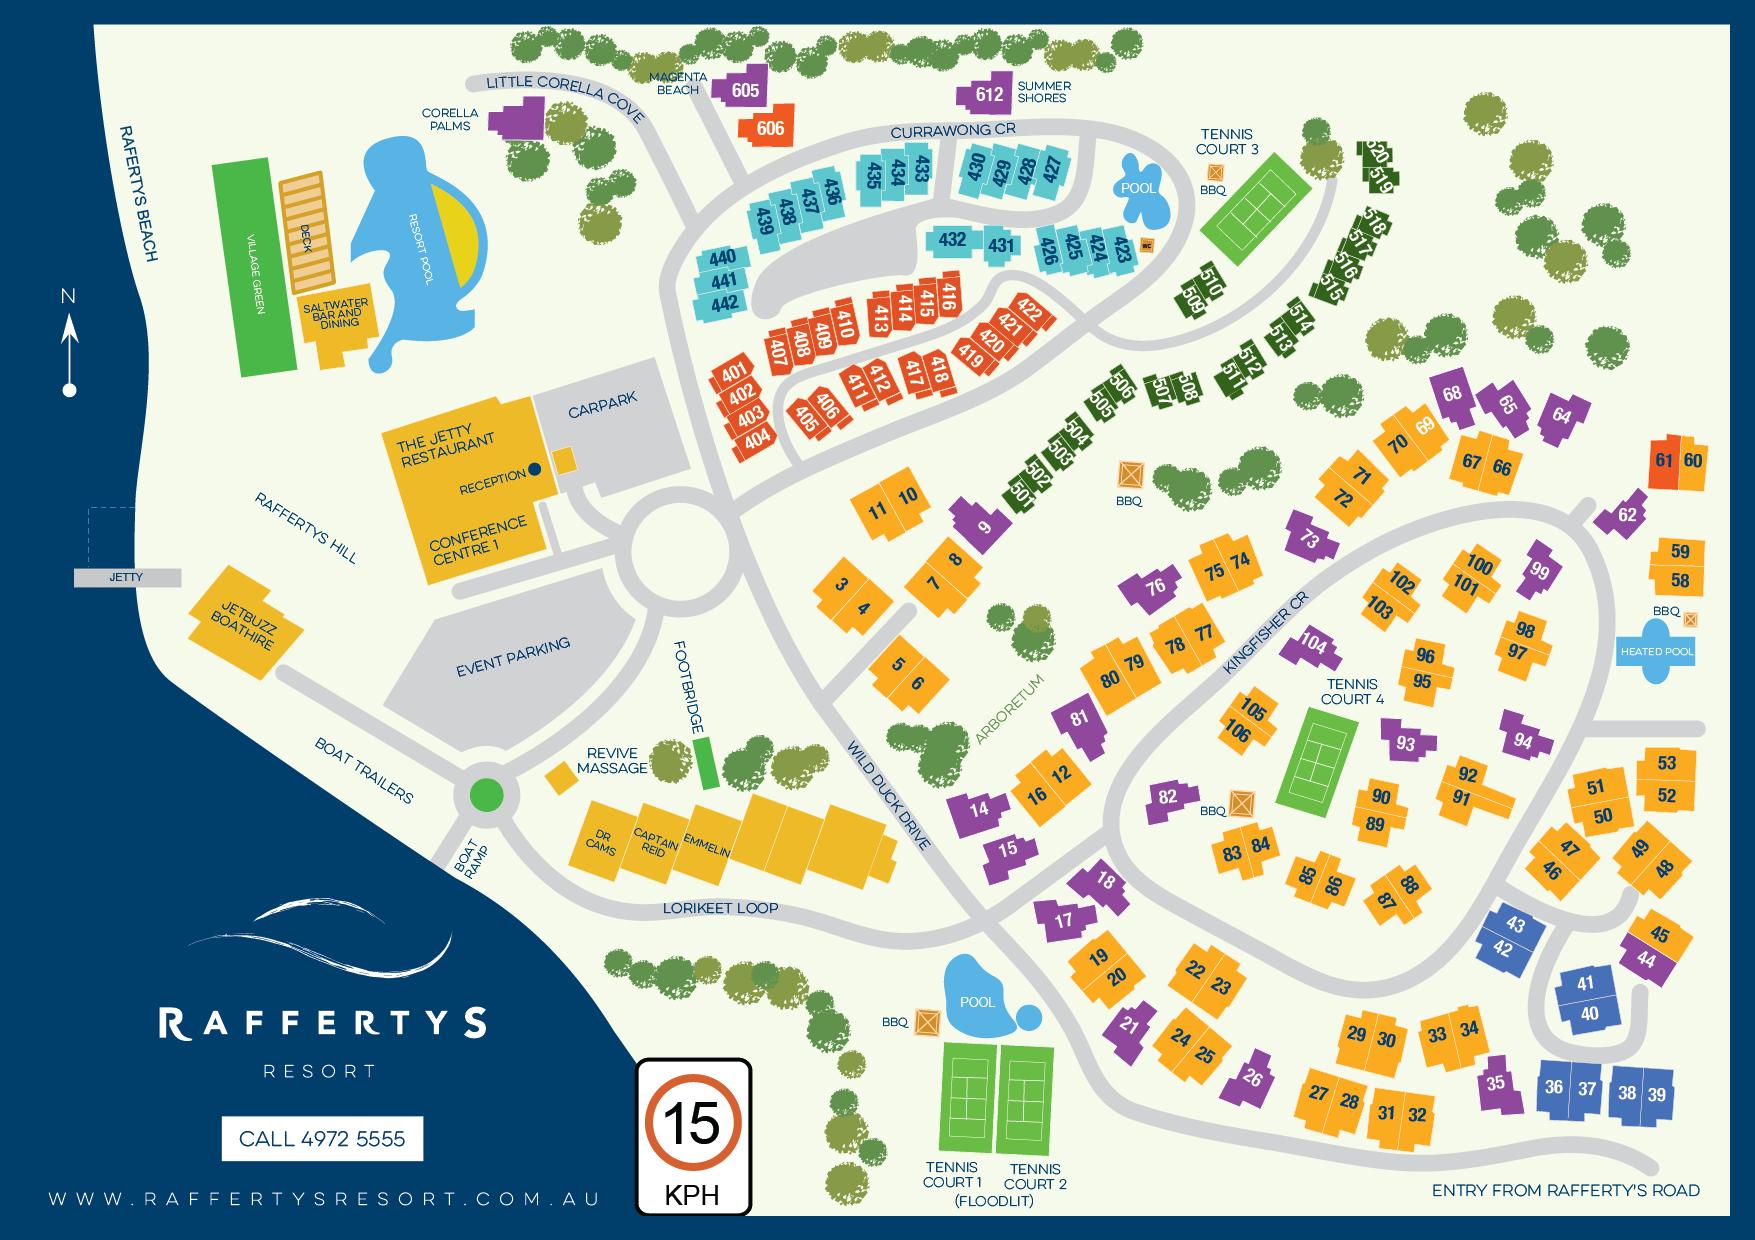 Resort Facilities and Map